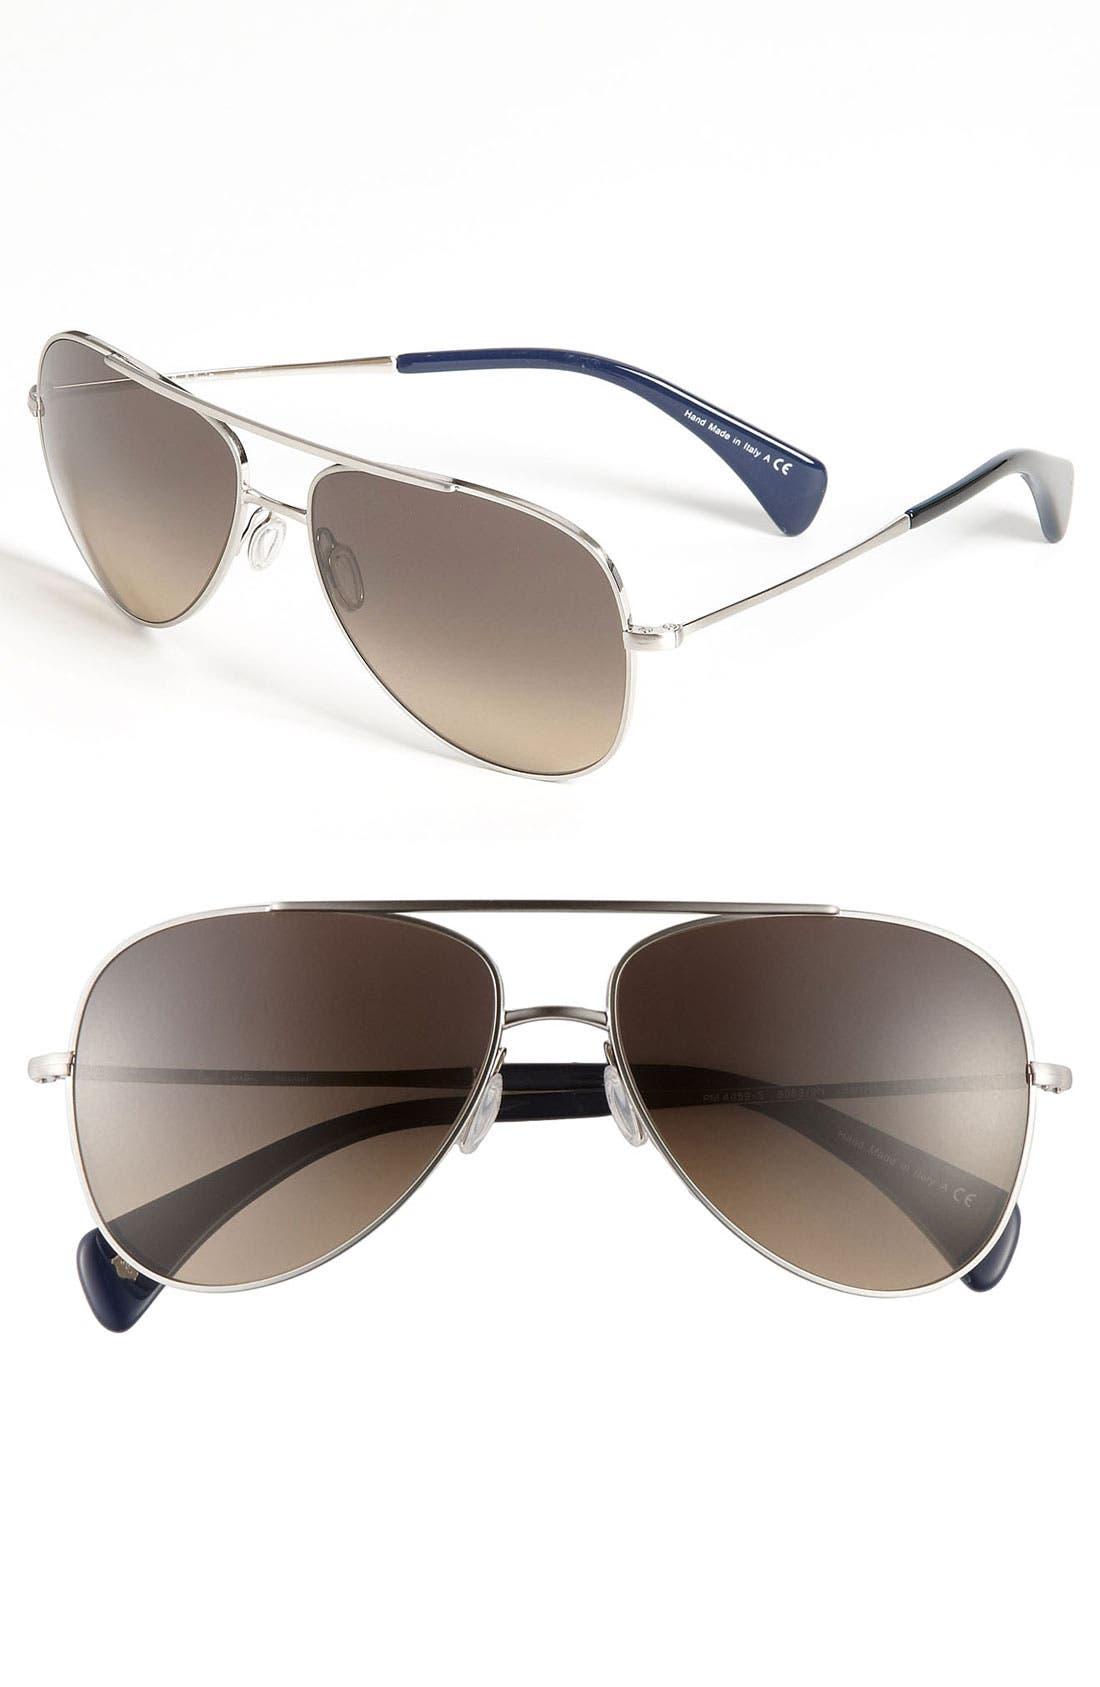 Alternate Image 1 Selected - Paul Smith 'Barrick' Polarized Aviator Sunglasses